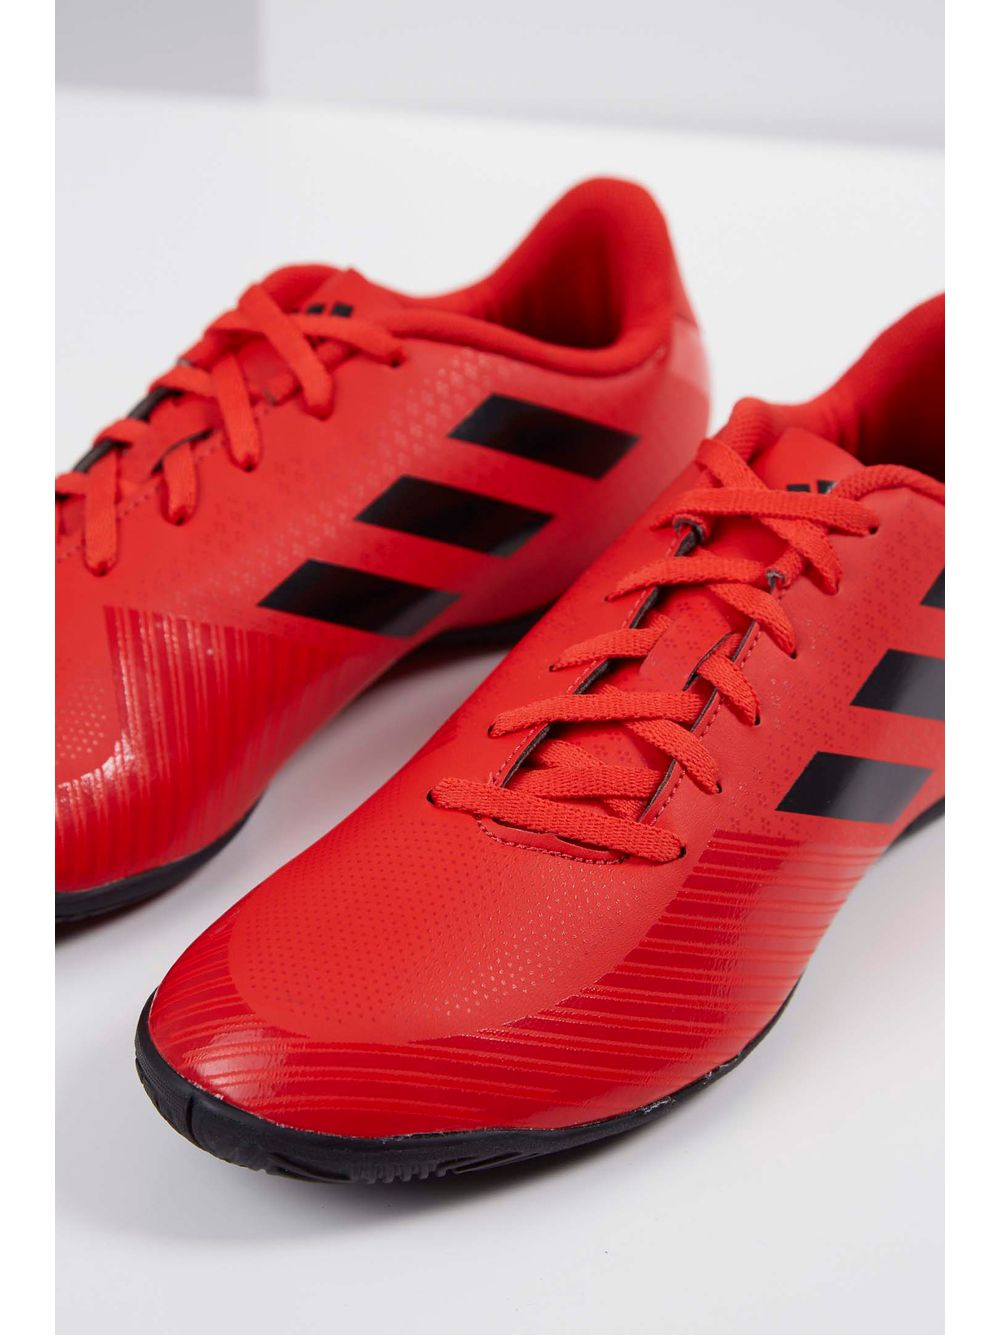 Tênis Adidas Artilheira Iii In Vermelho - pittol 1f42a1fee98be